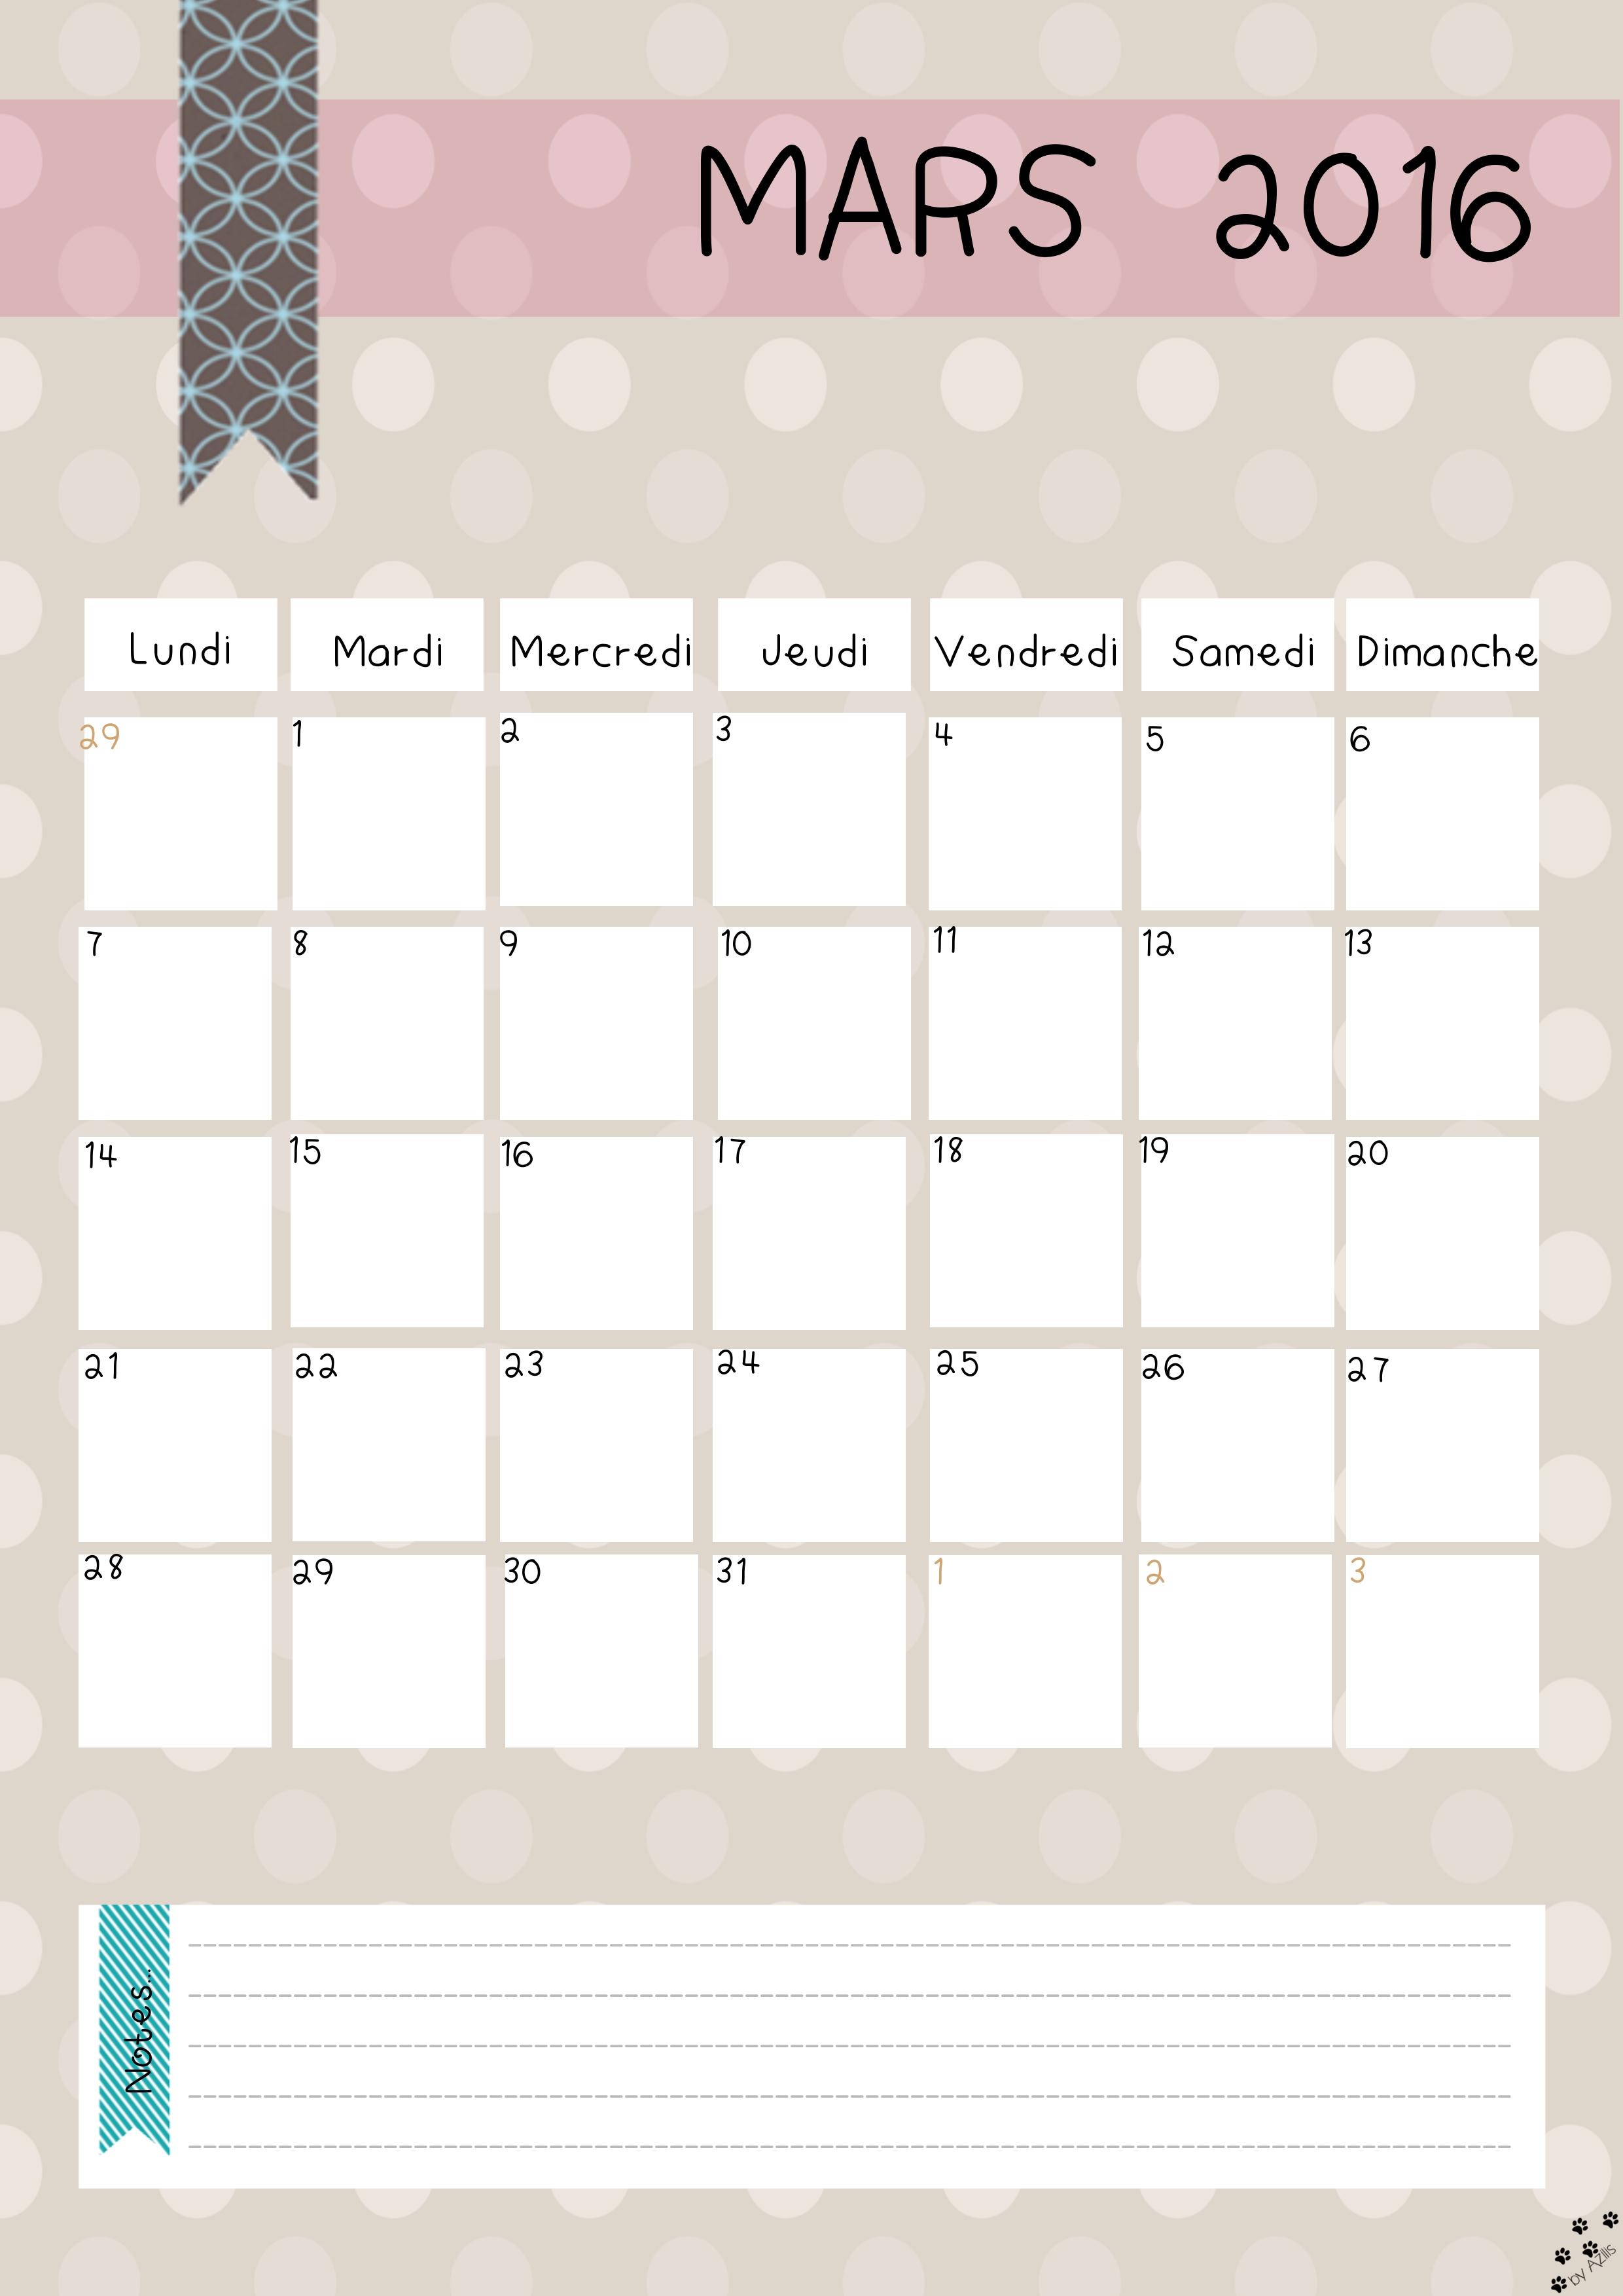 Calendrier mars 2016 for Calendrier jardin mars 2016